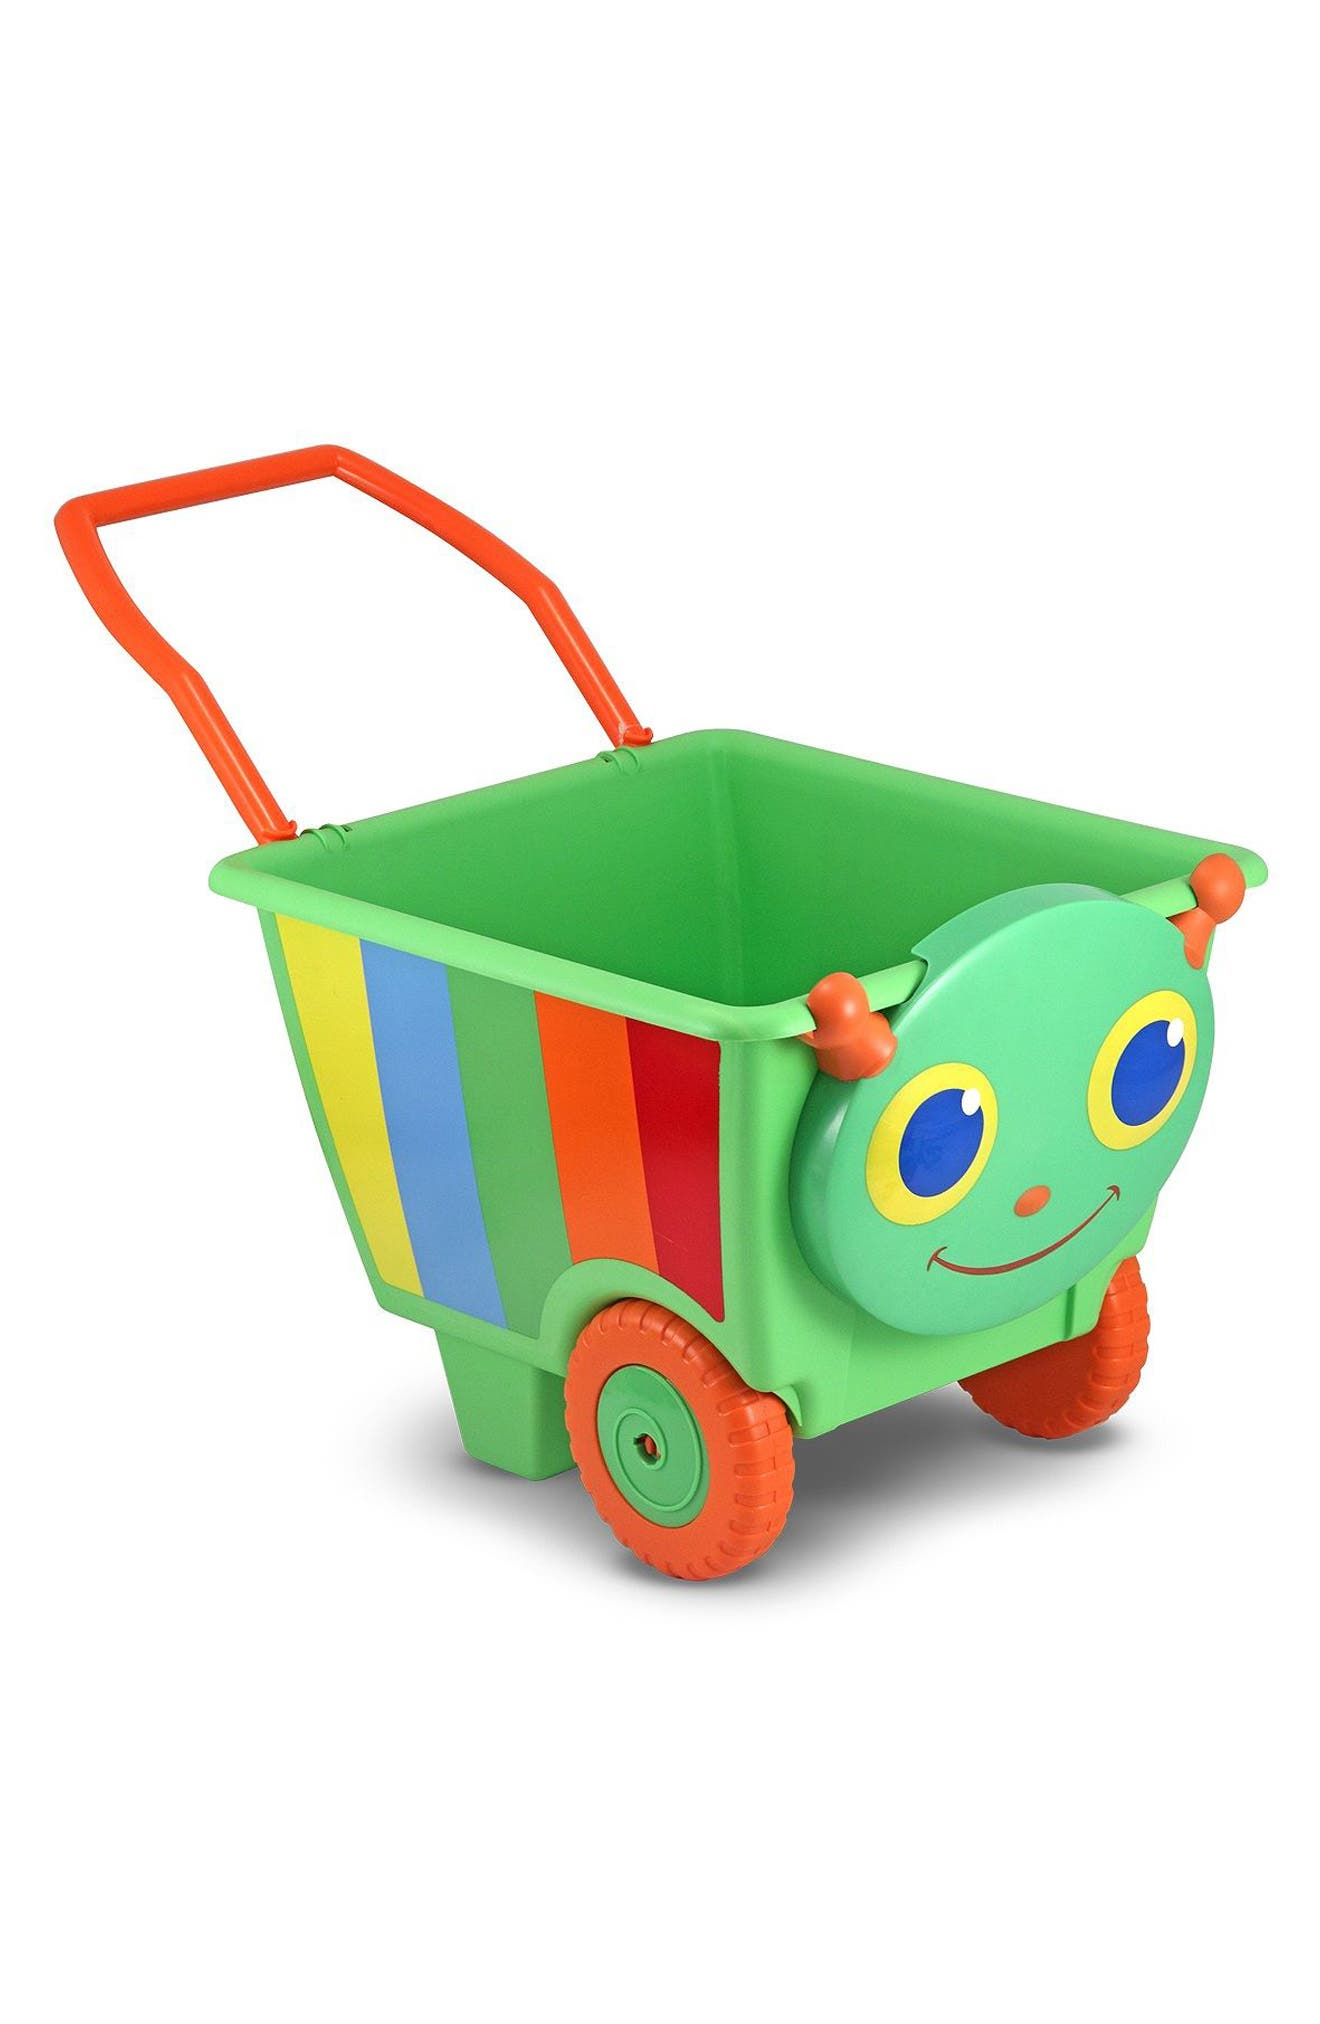 Melissa & Doug 'Happy Giddy' Cart